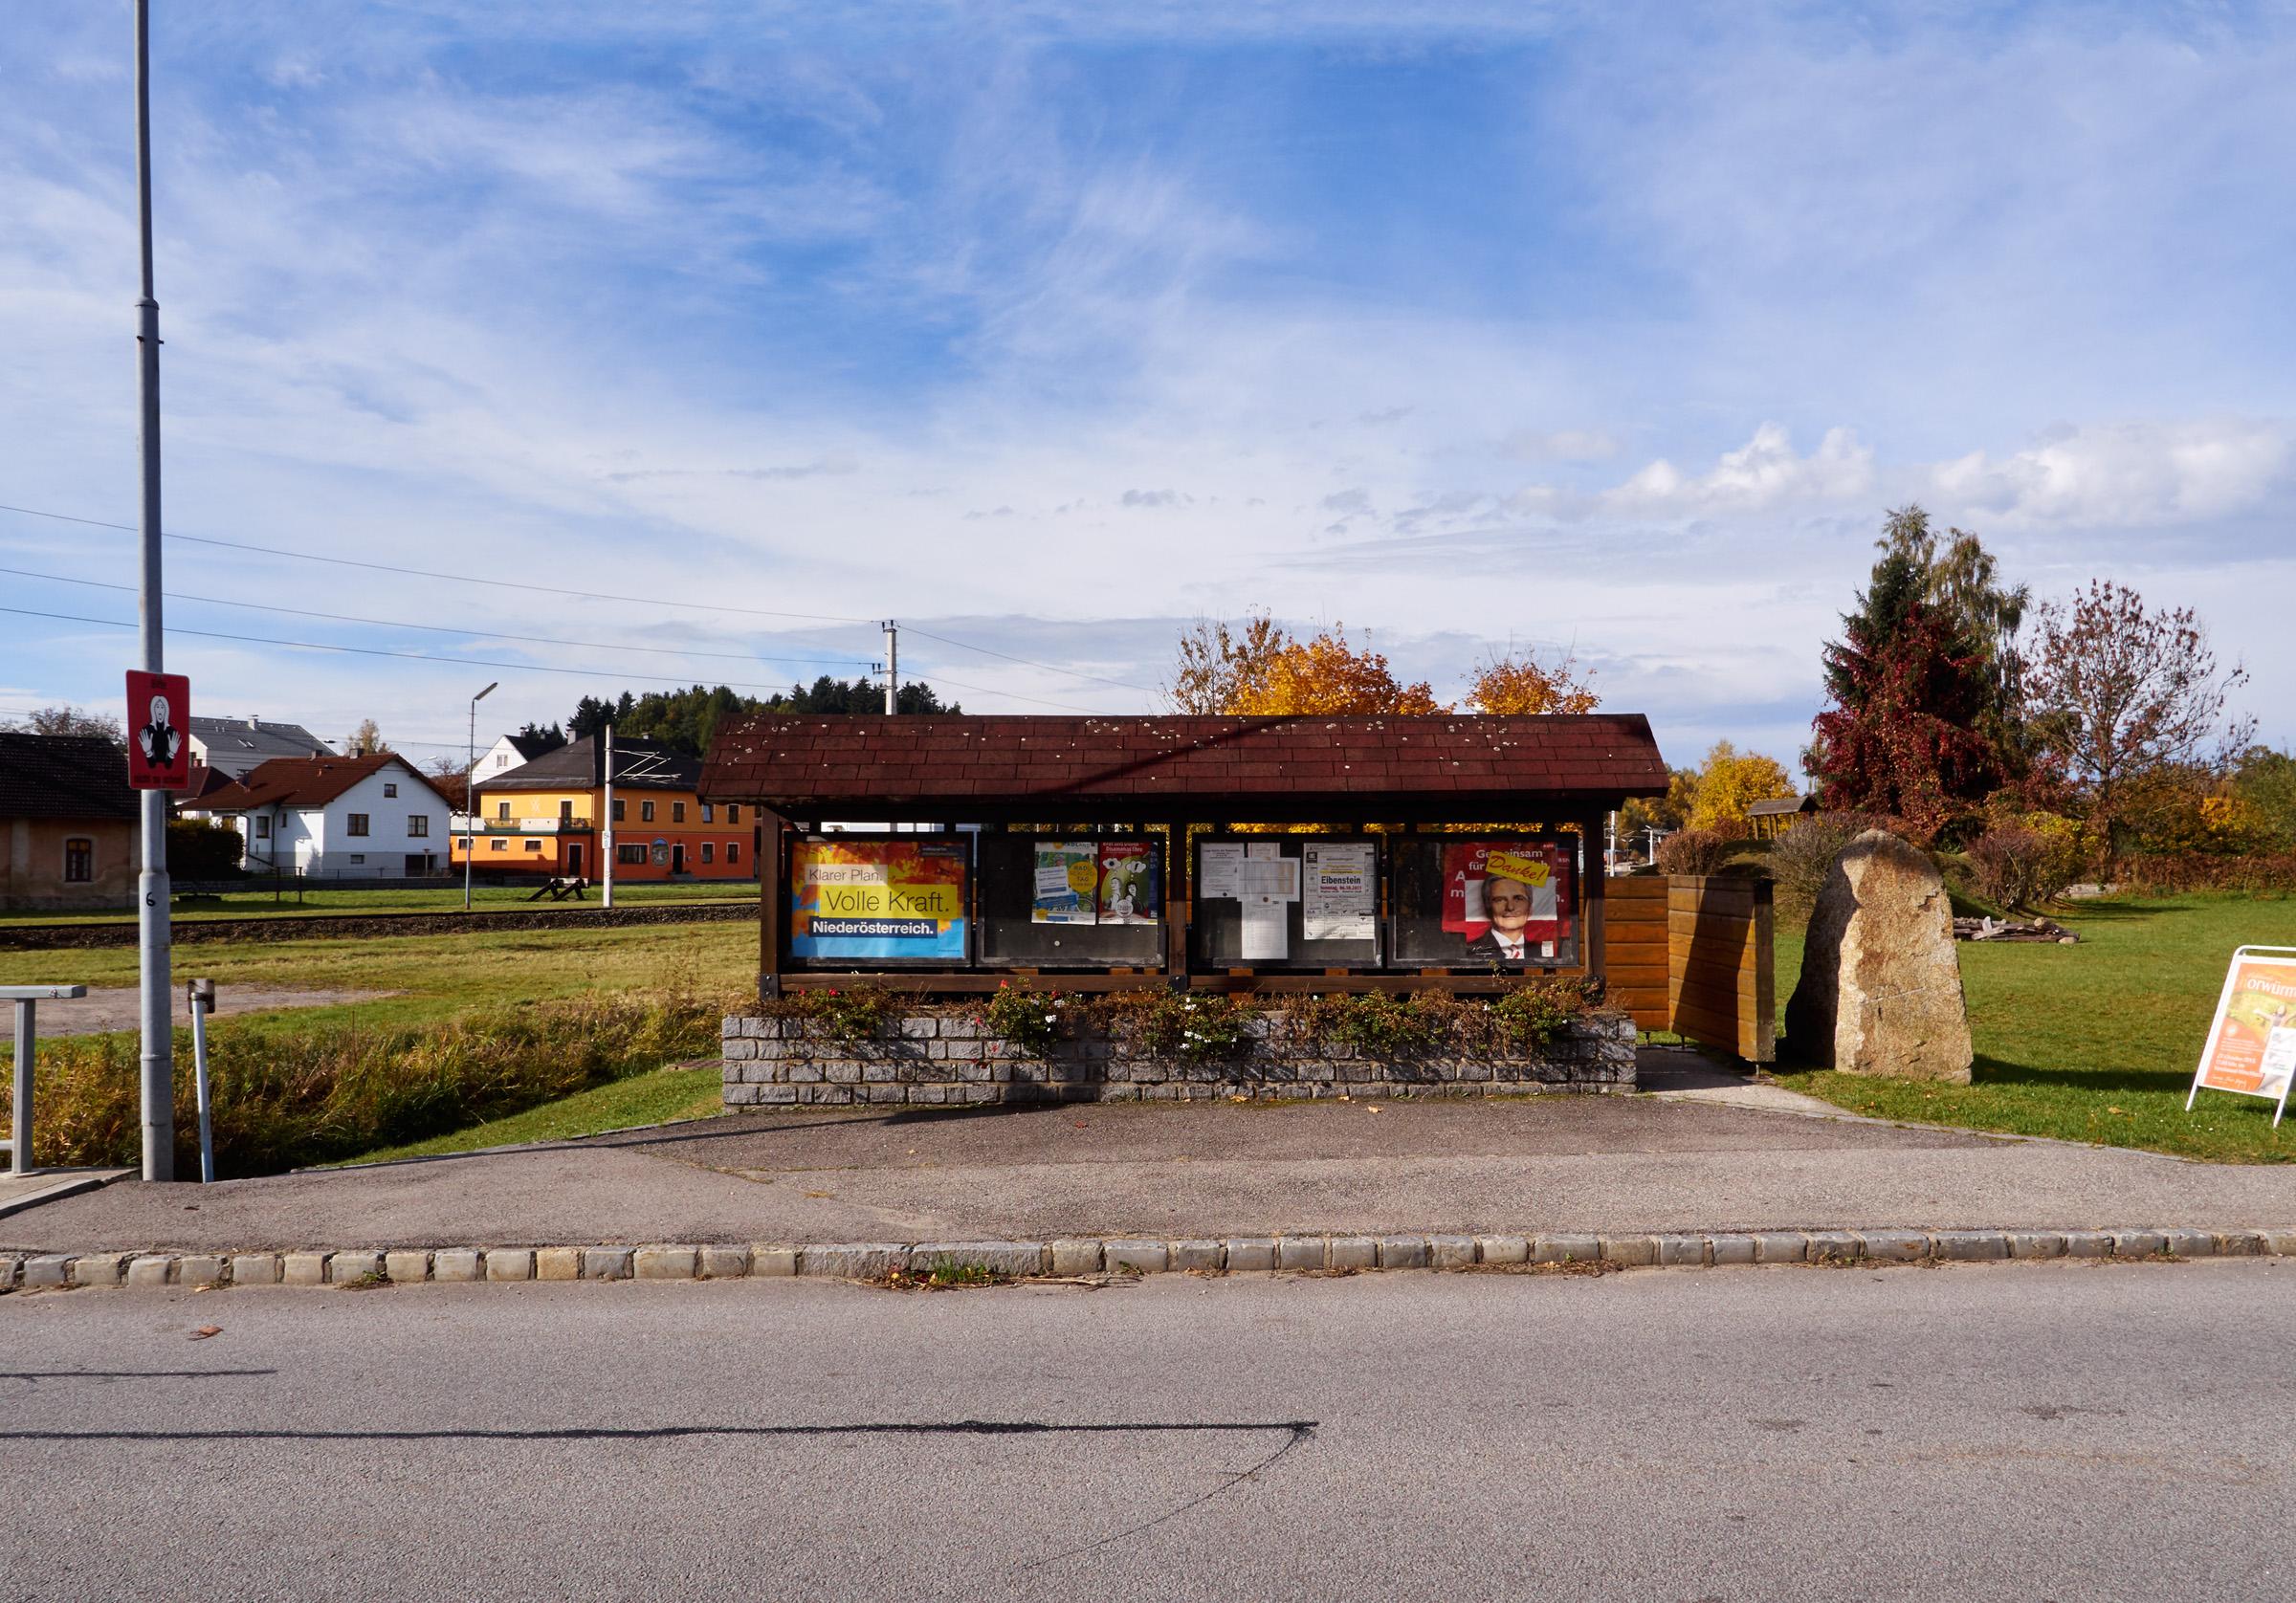 Pürbach weit 2013-10-15.jpg